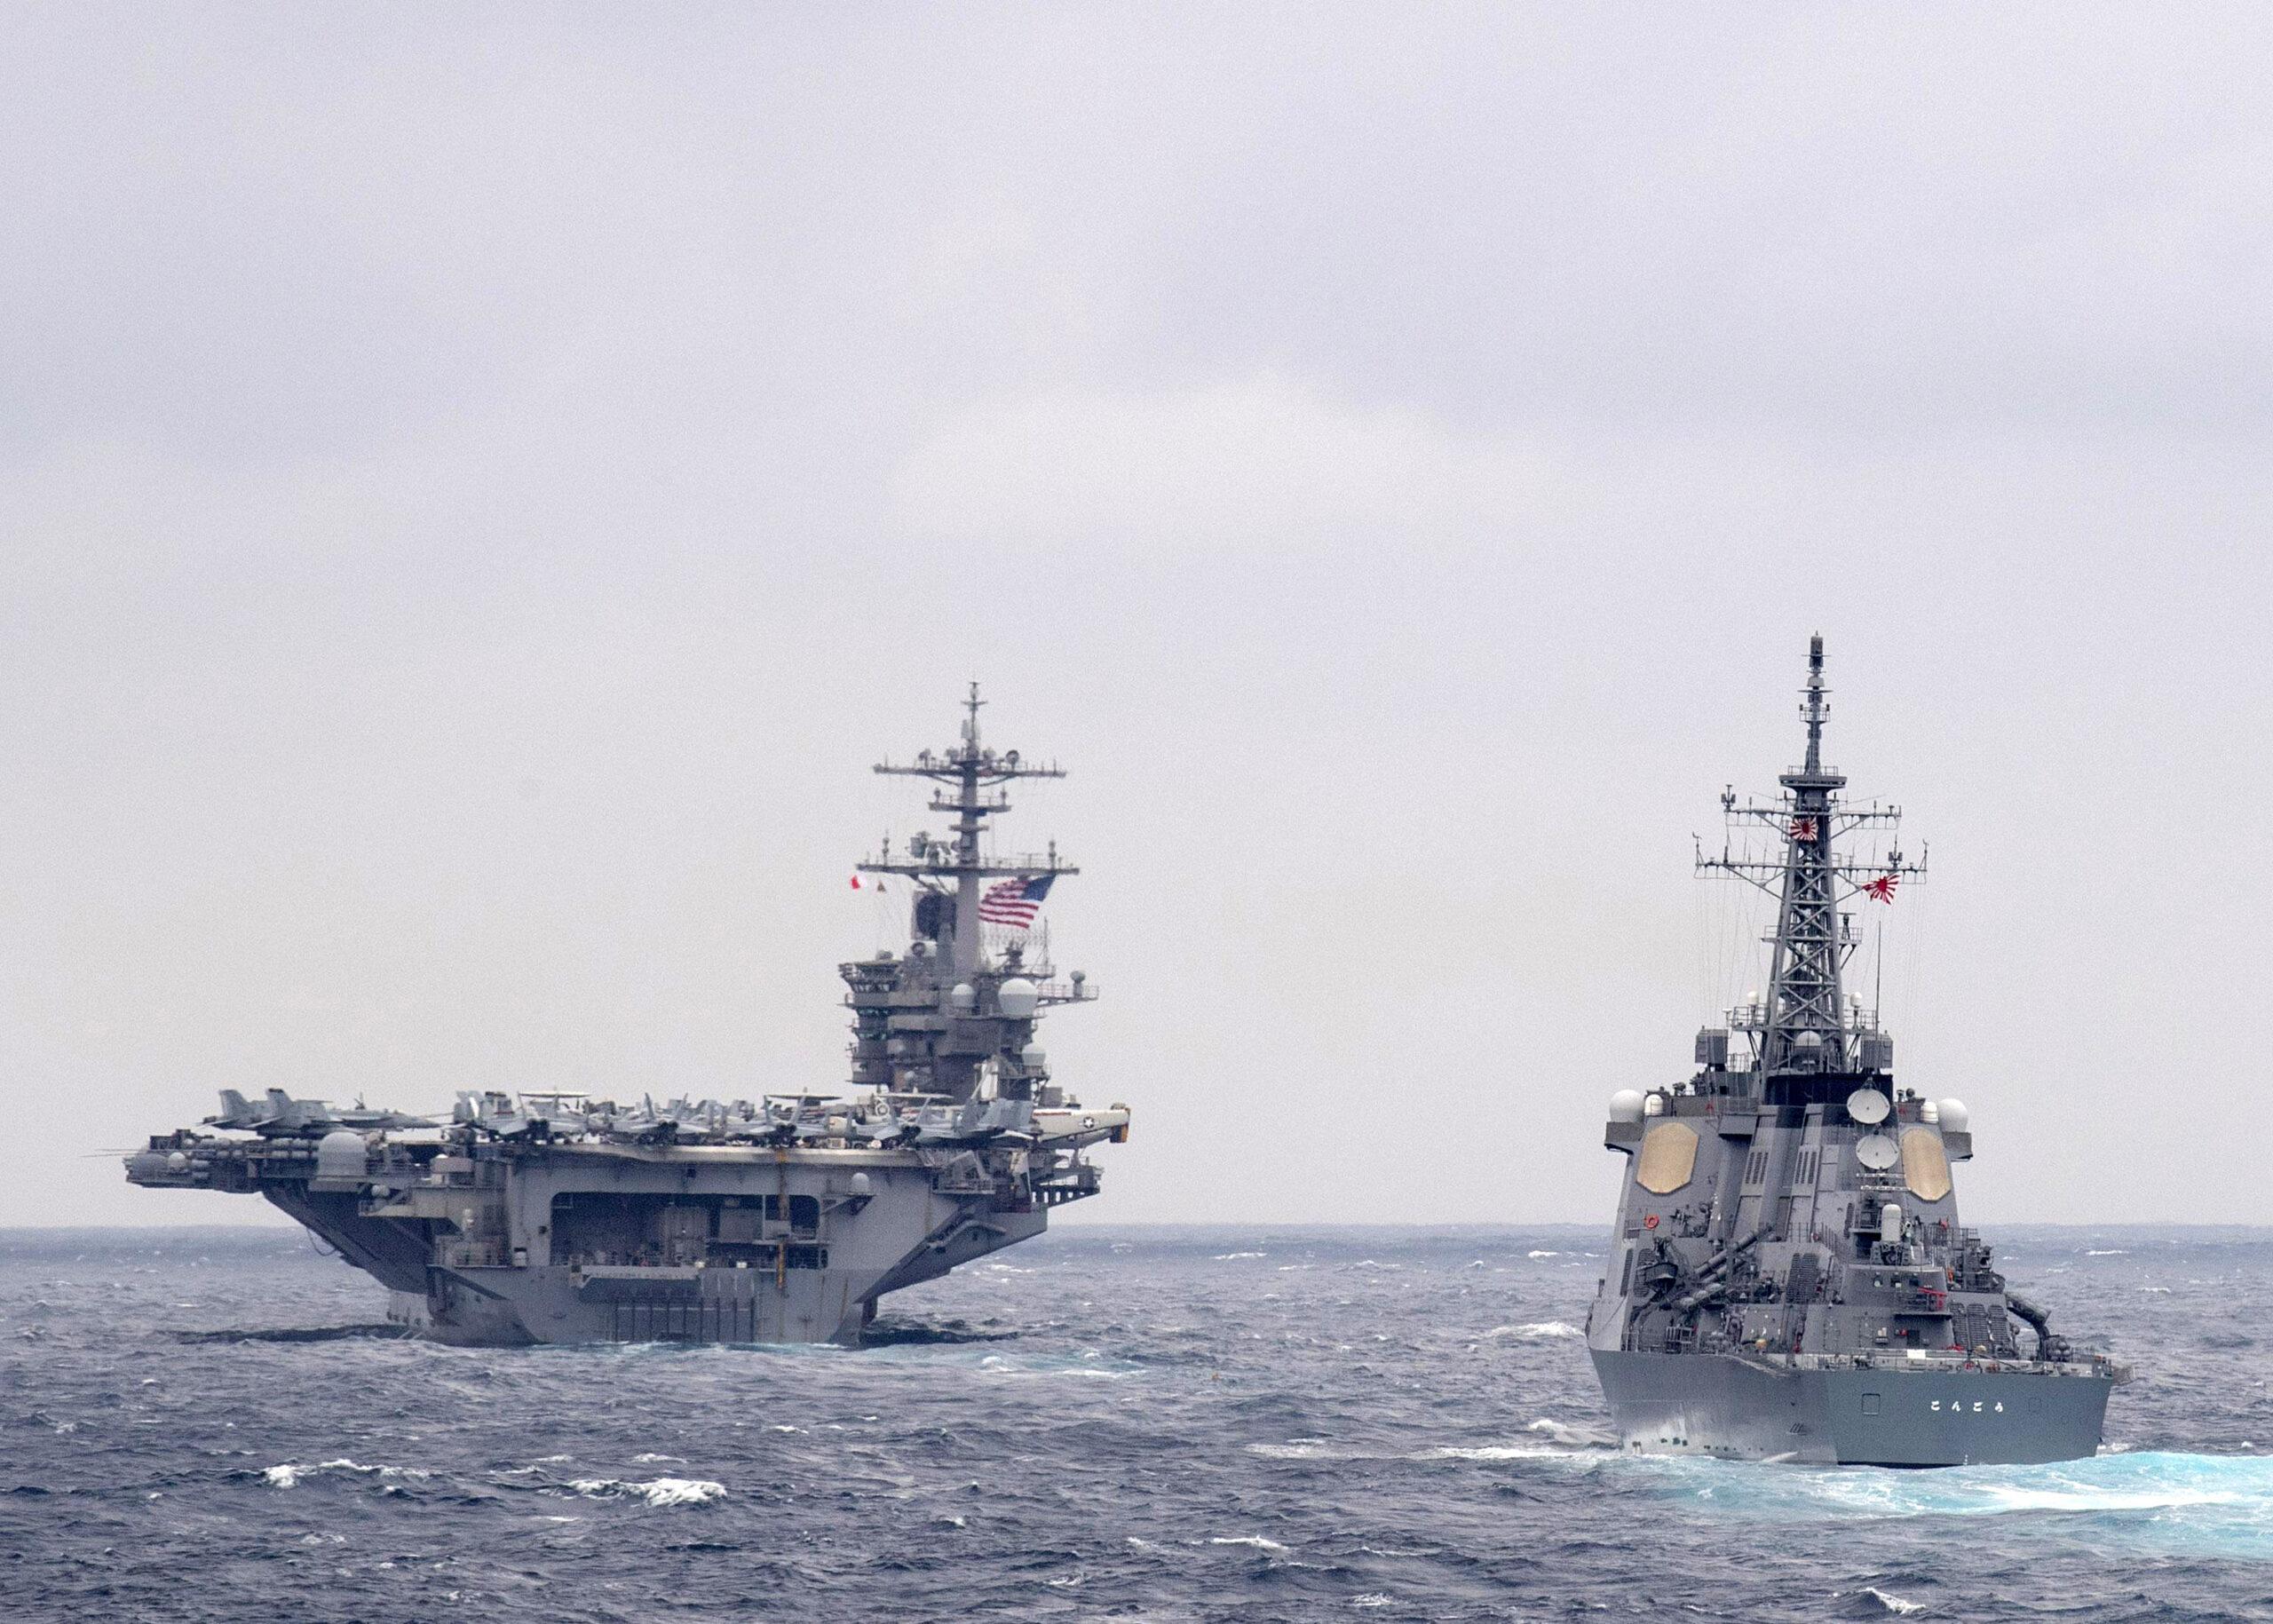 210115 n hi500 1049 scaled - naval post- naval news and information